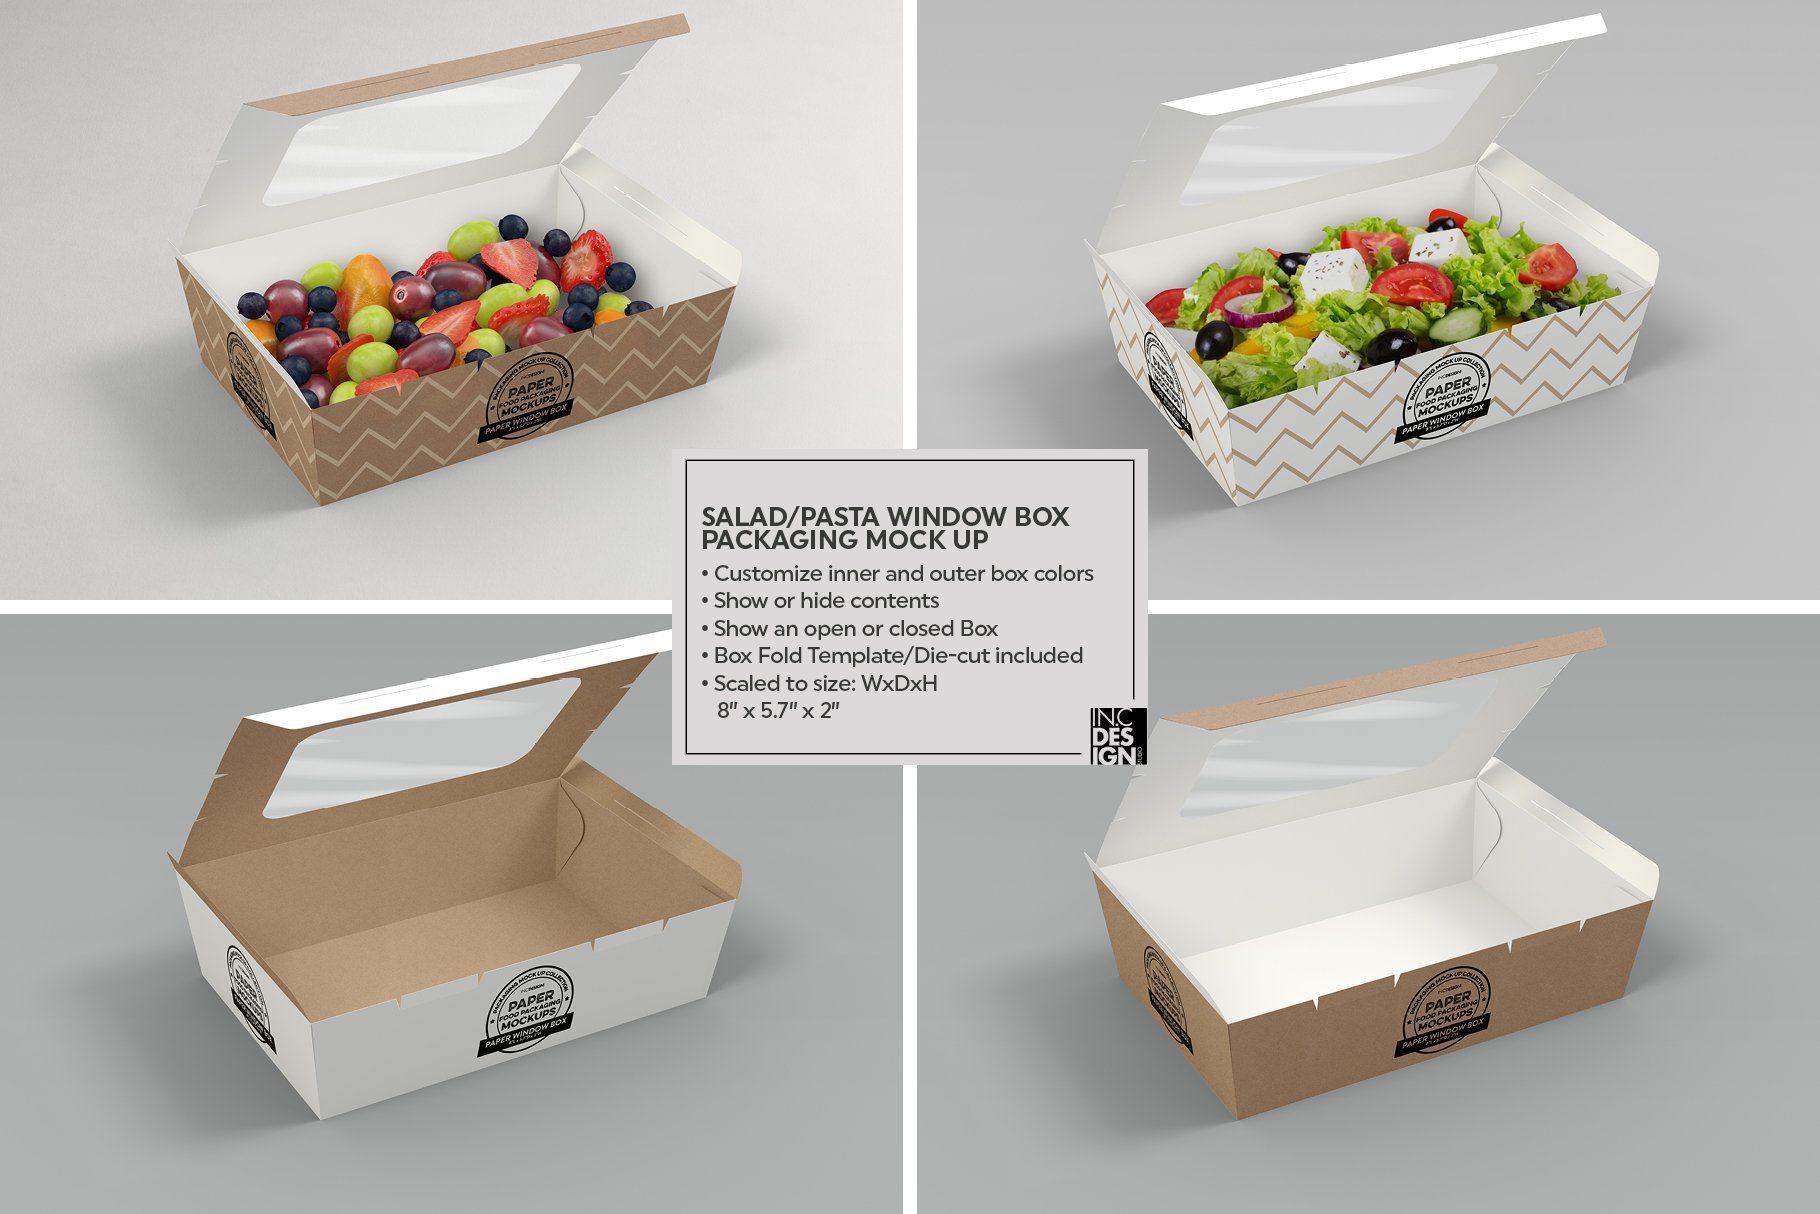 Download Clamshell Window Box Mockup Box Mockup Free Packaging Mockup Window Box